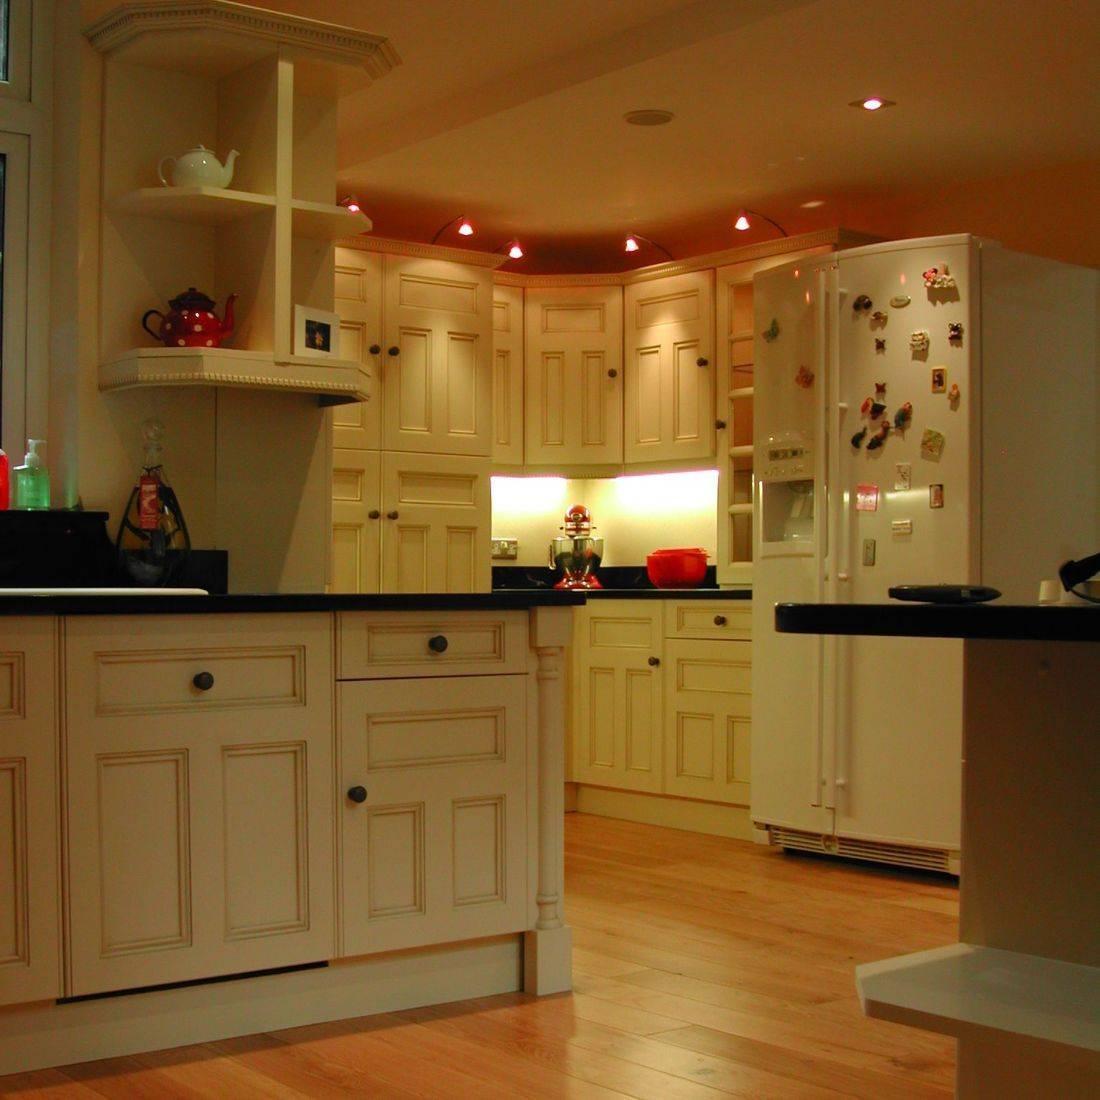 fitted kitchen mwif.co.uk oak floor black granite worktops